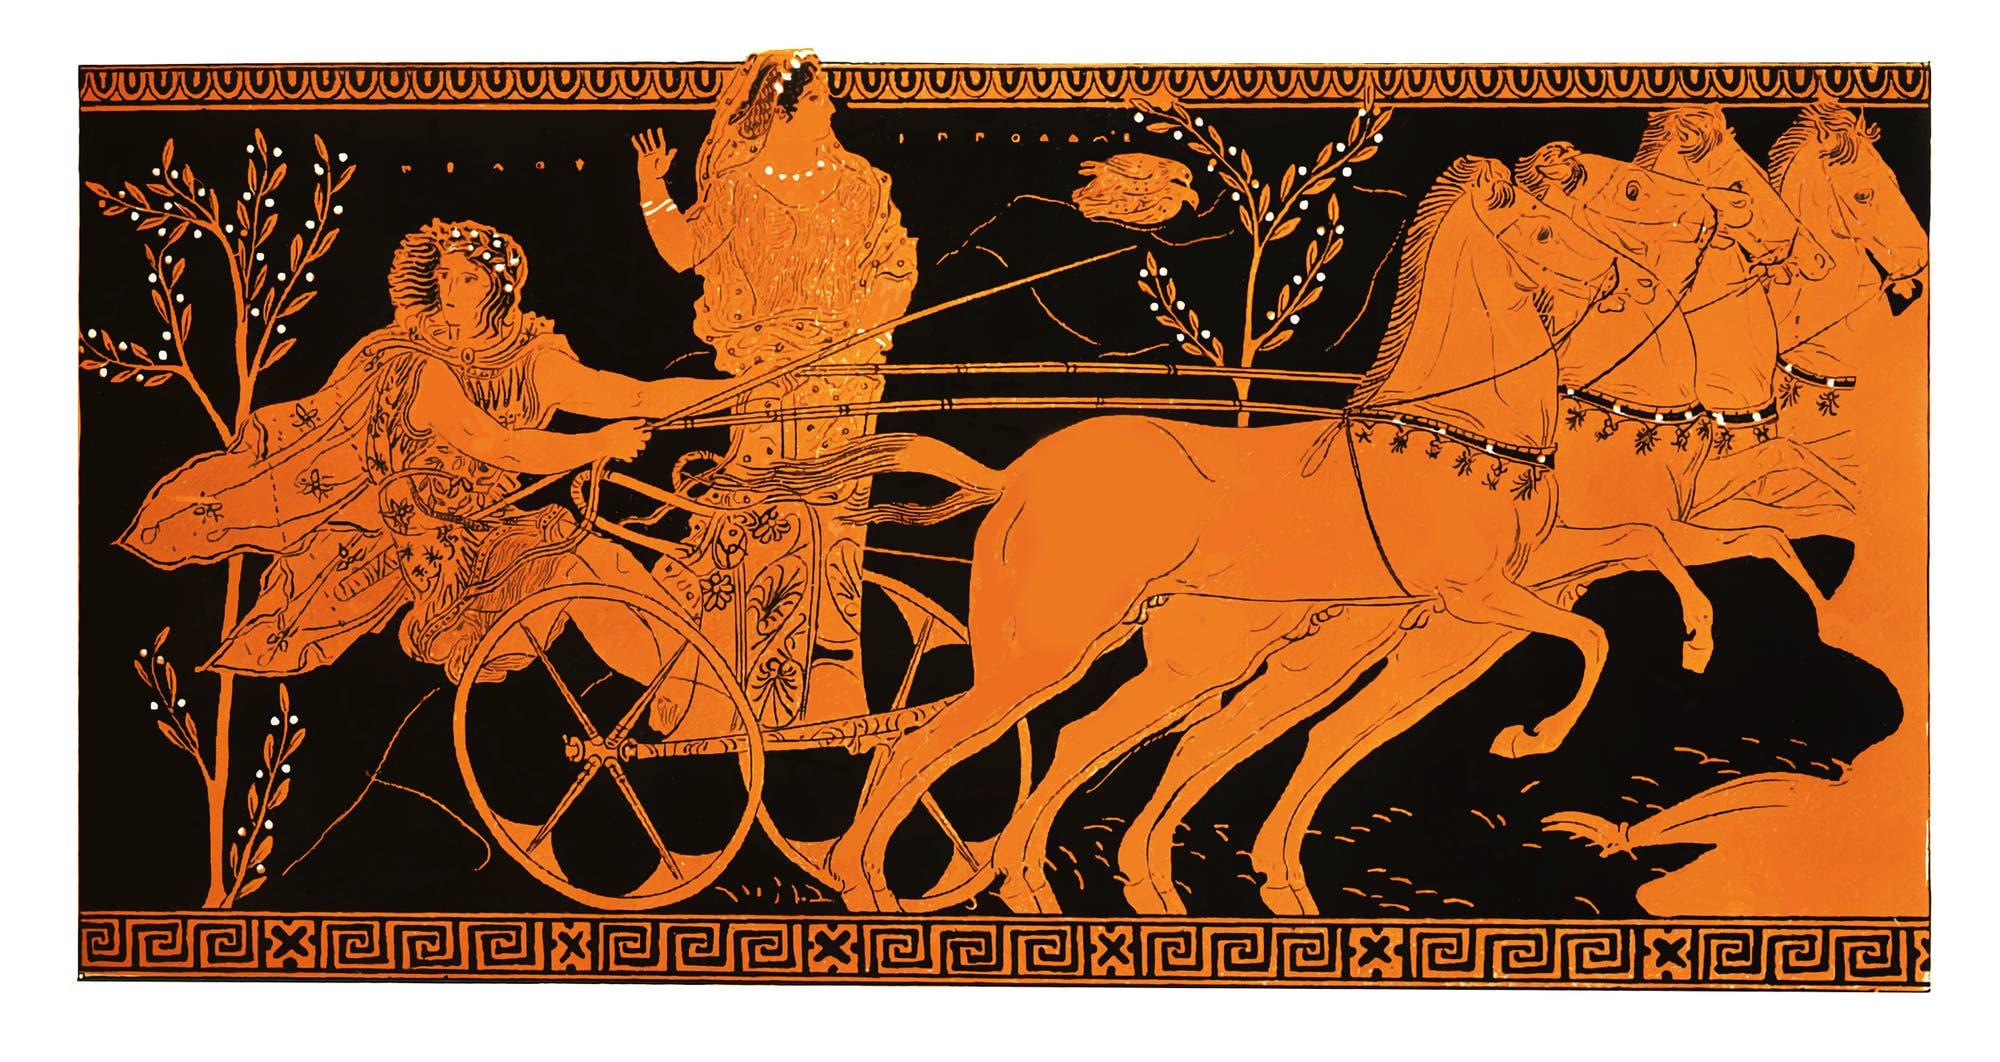 Pelops und Hippodameia